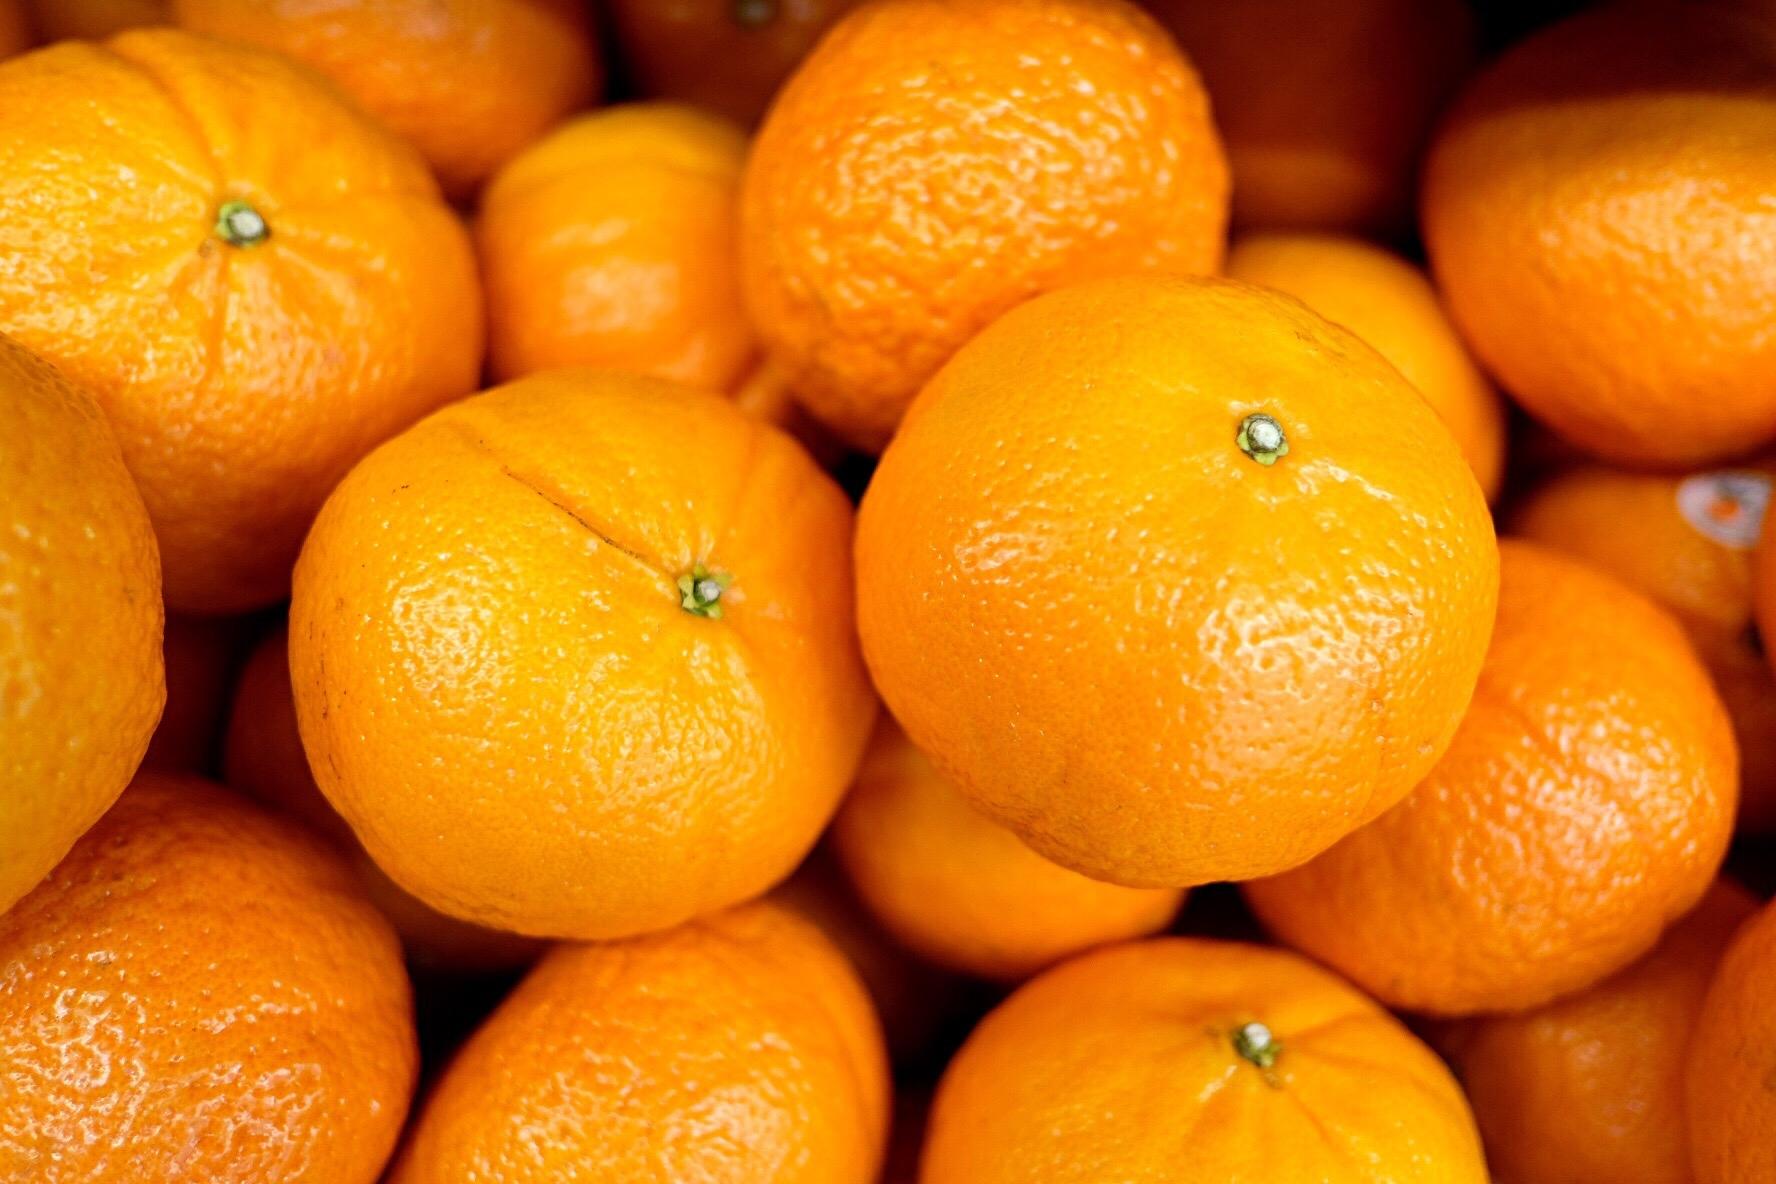 Full Frame Shot Of Oranges For Sale At Market Stall